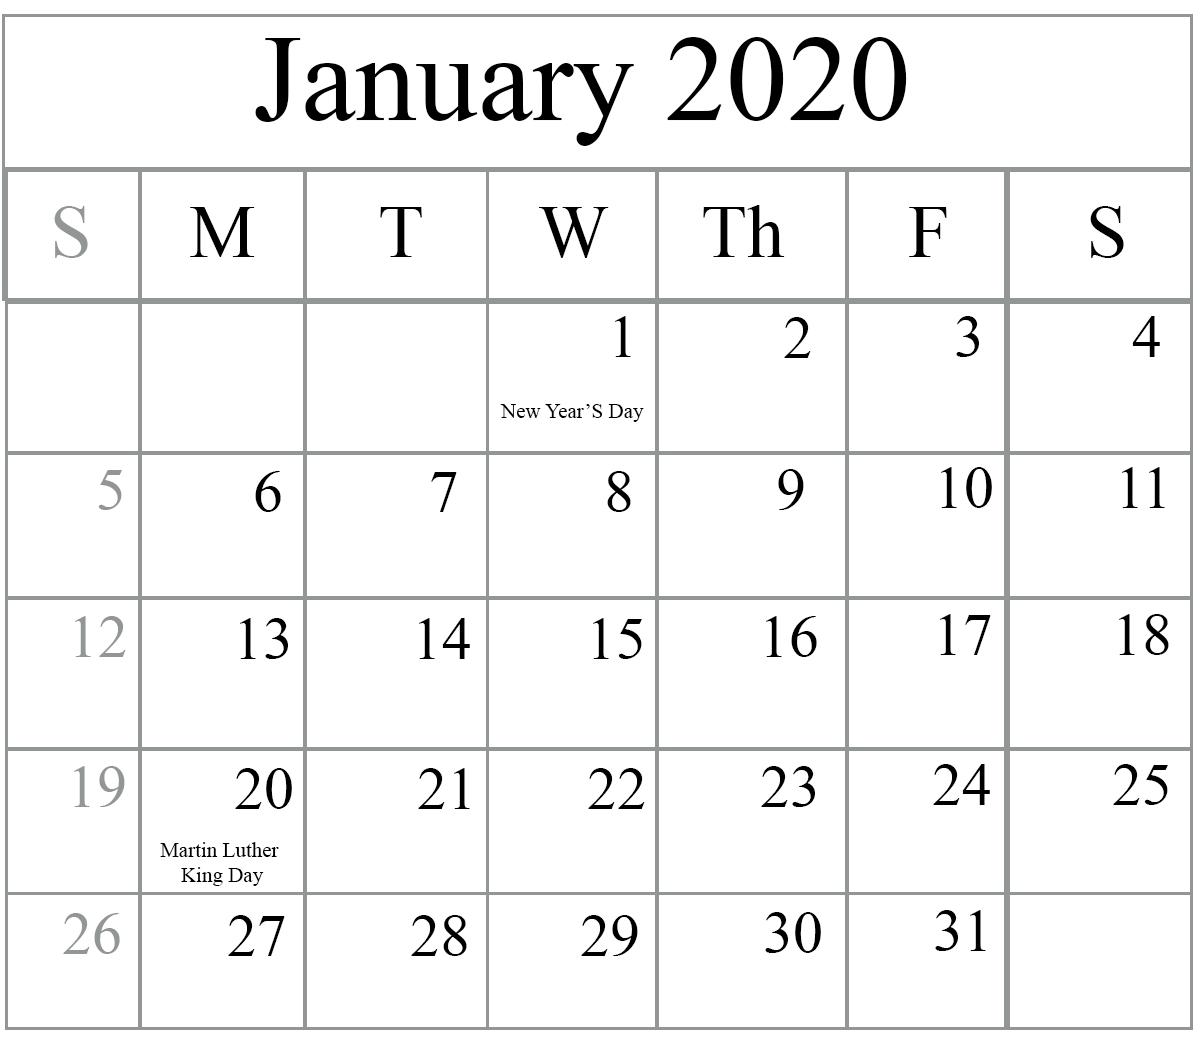 Blank January 2020 Calendar Printable In Pdf, Word, Excel-January 2020 Calendar Pdf